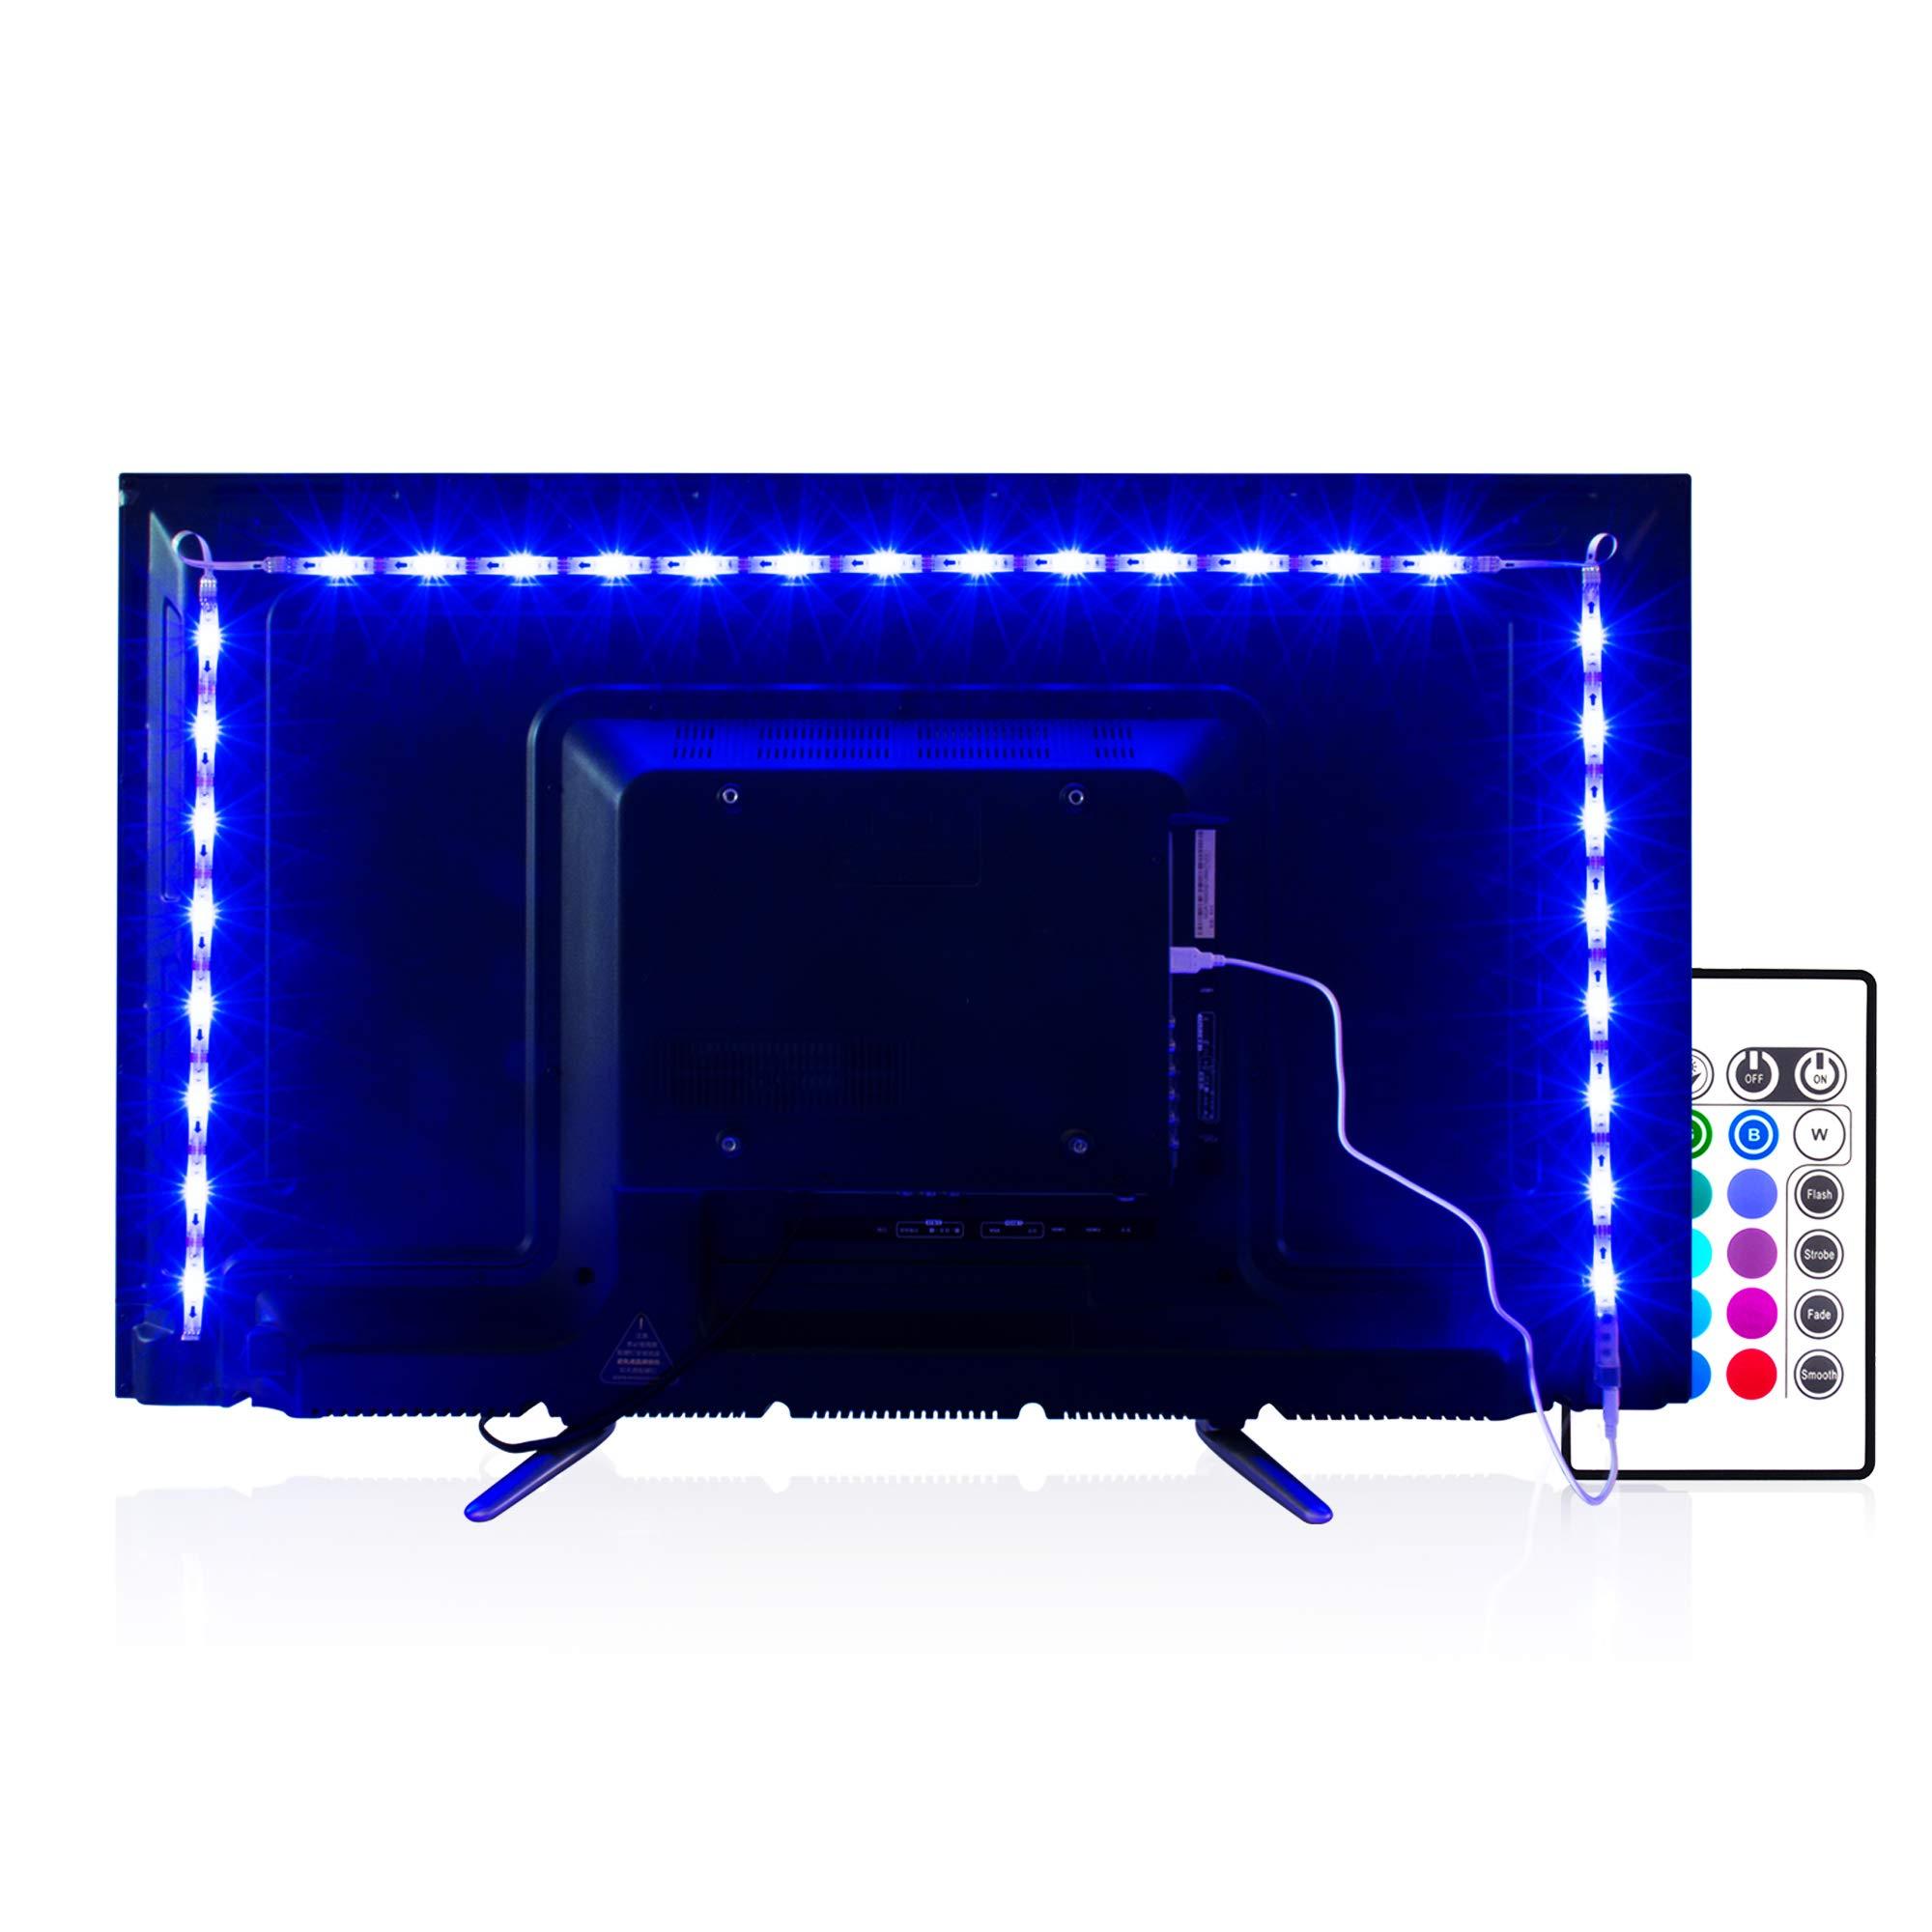 PANGTON VILLA Led Strips Lights, 2m USB TV Backlight Kit with Remote for 40-60in TV, Bias Lighting RGB Light Strips TV Led Lights [Energy Class A+]